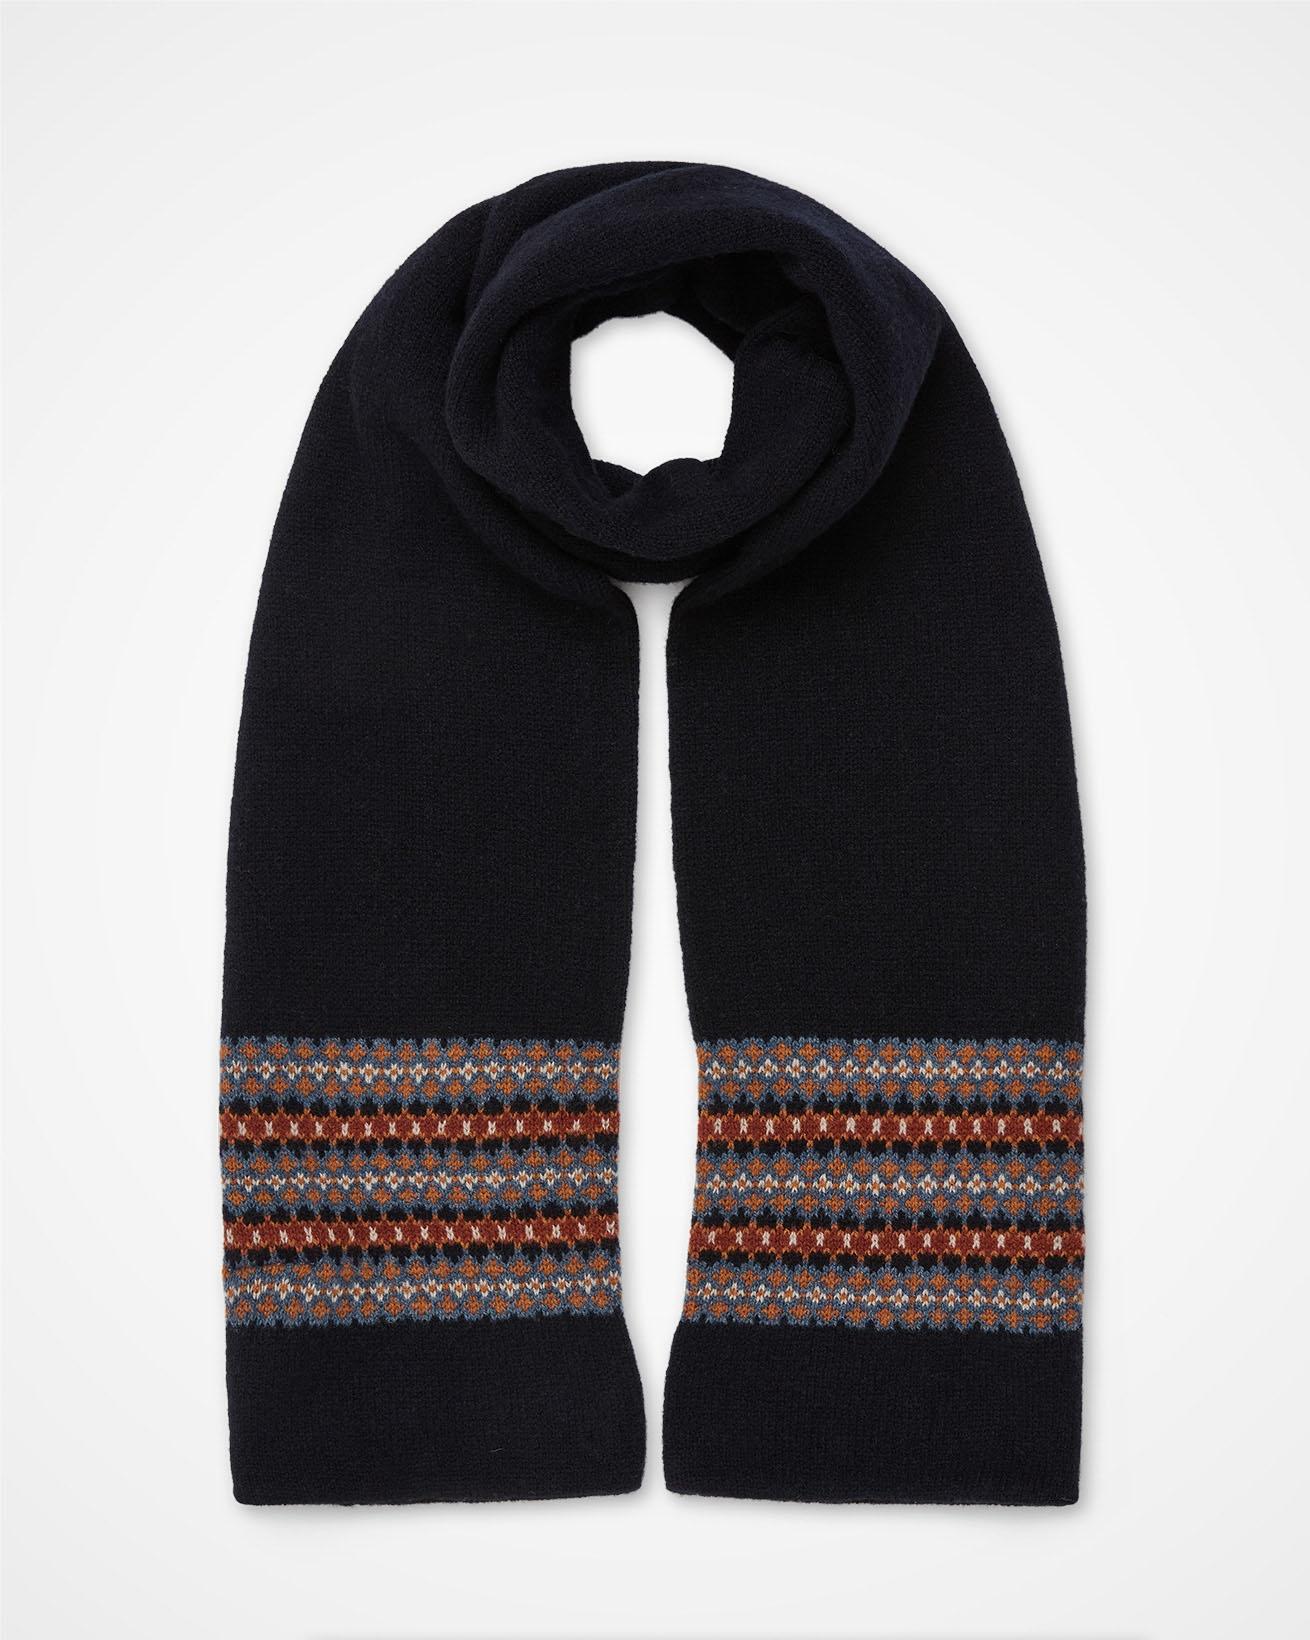 7749_lambswool-fairisle-scarf_dark-navy_1_cutout_web.jpg